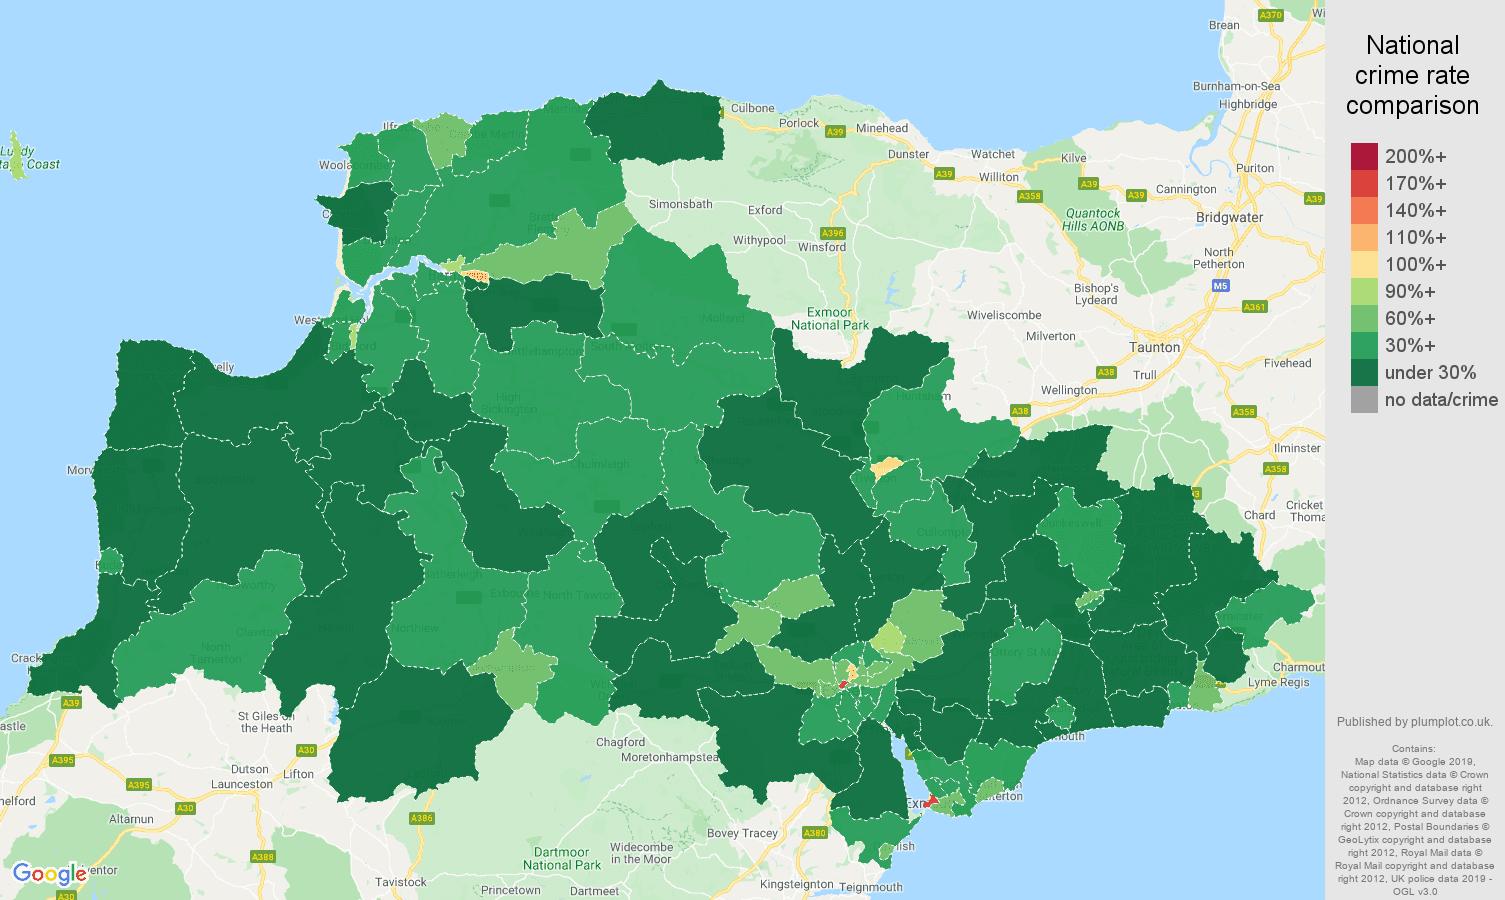 Exeter public order crime rate comparison map